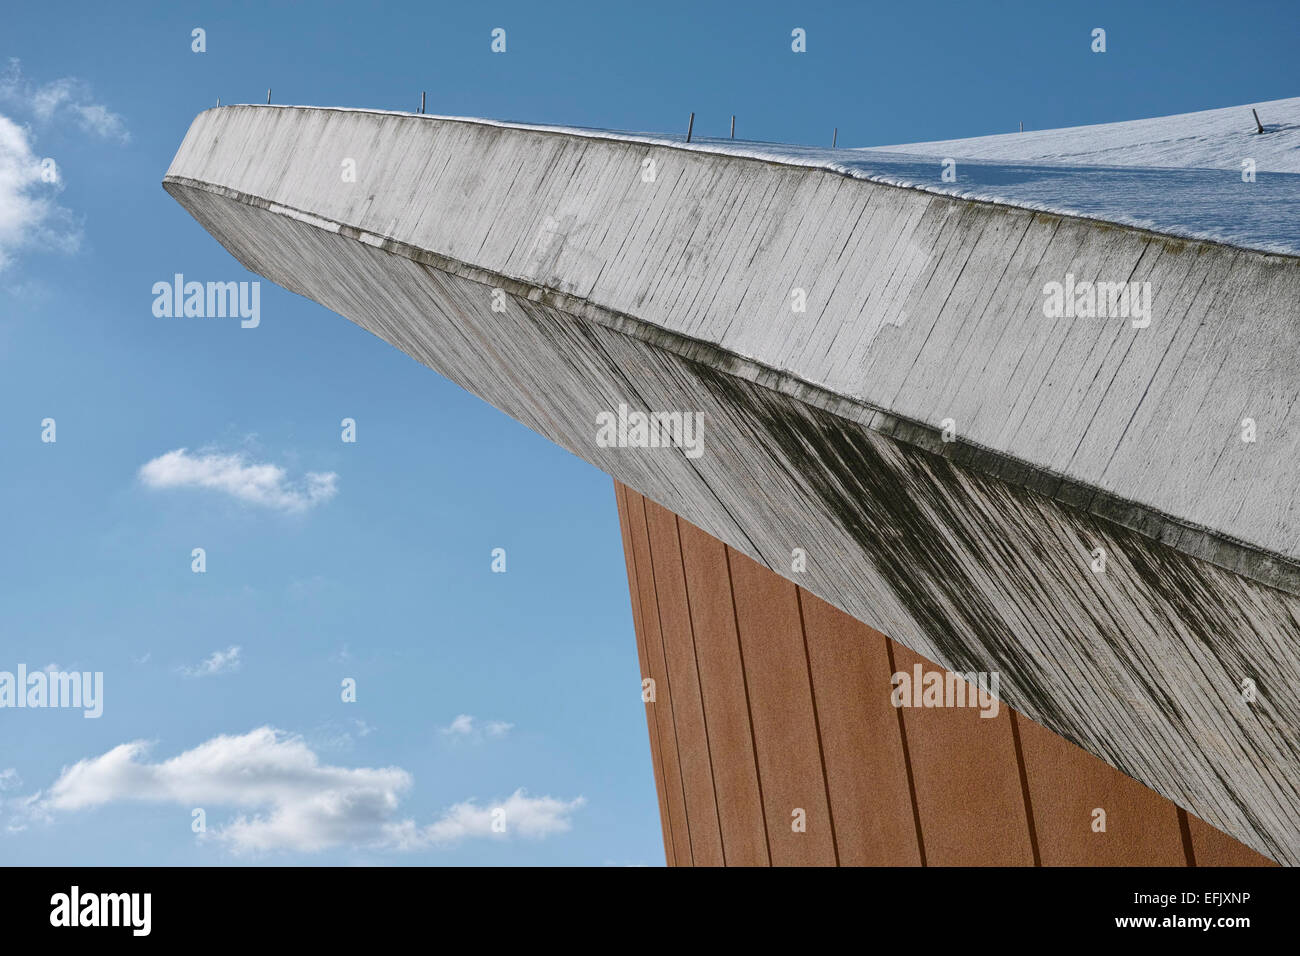 The Haus der Kulturen der Welt (House of World Cultures) in Berlin, detail shot of the roof. - Stock Image